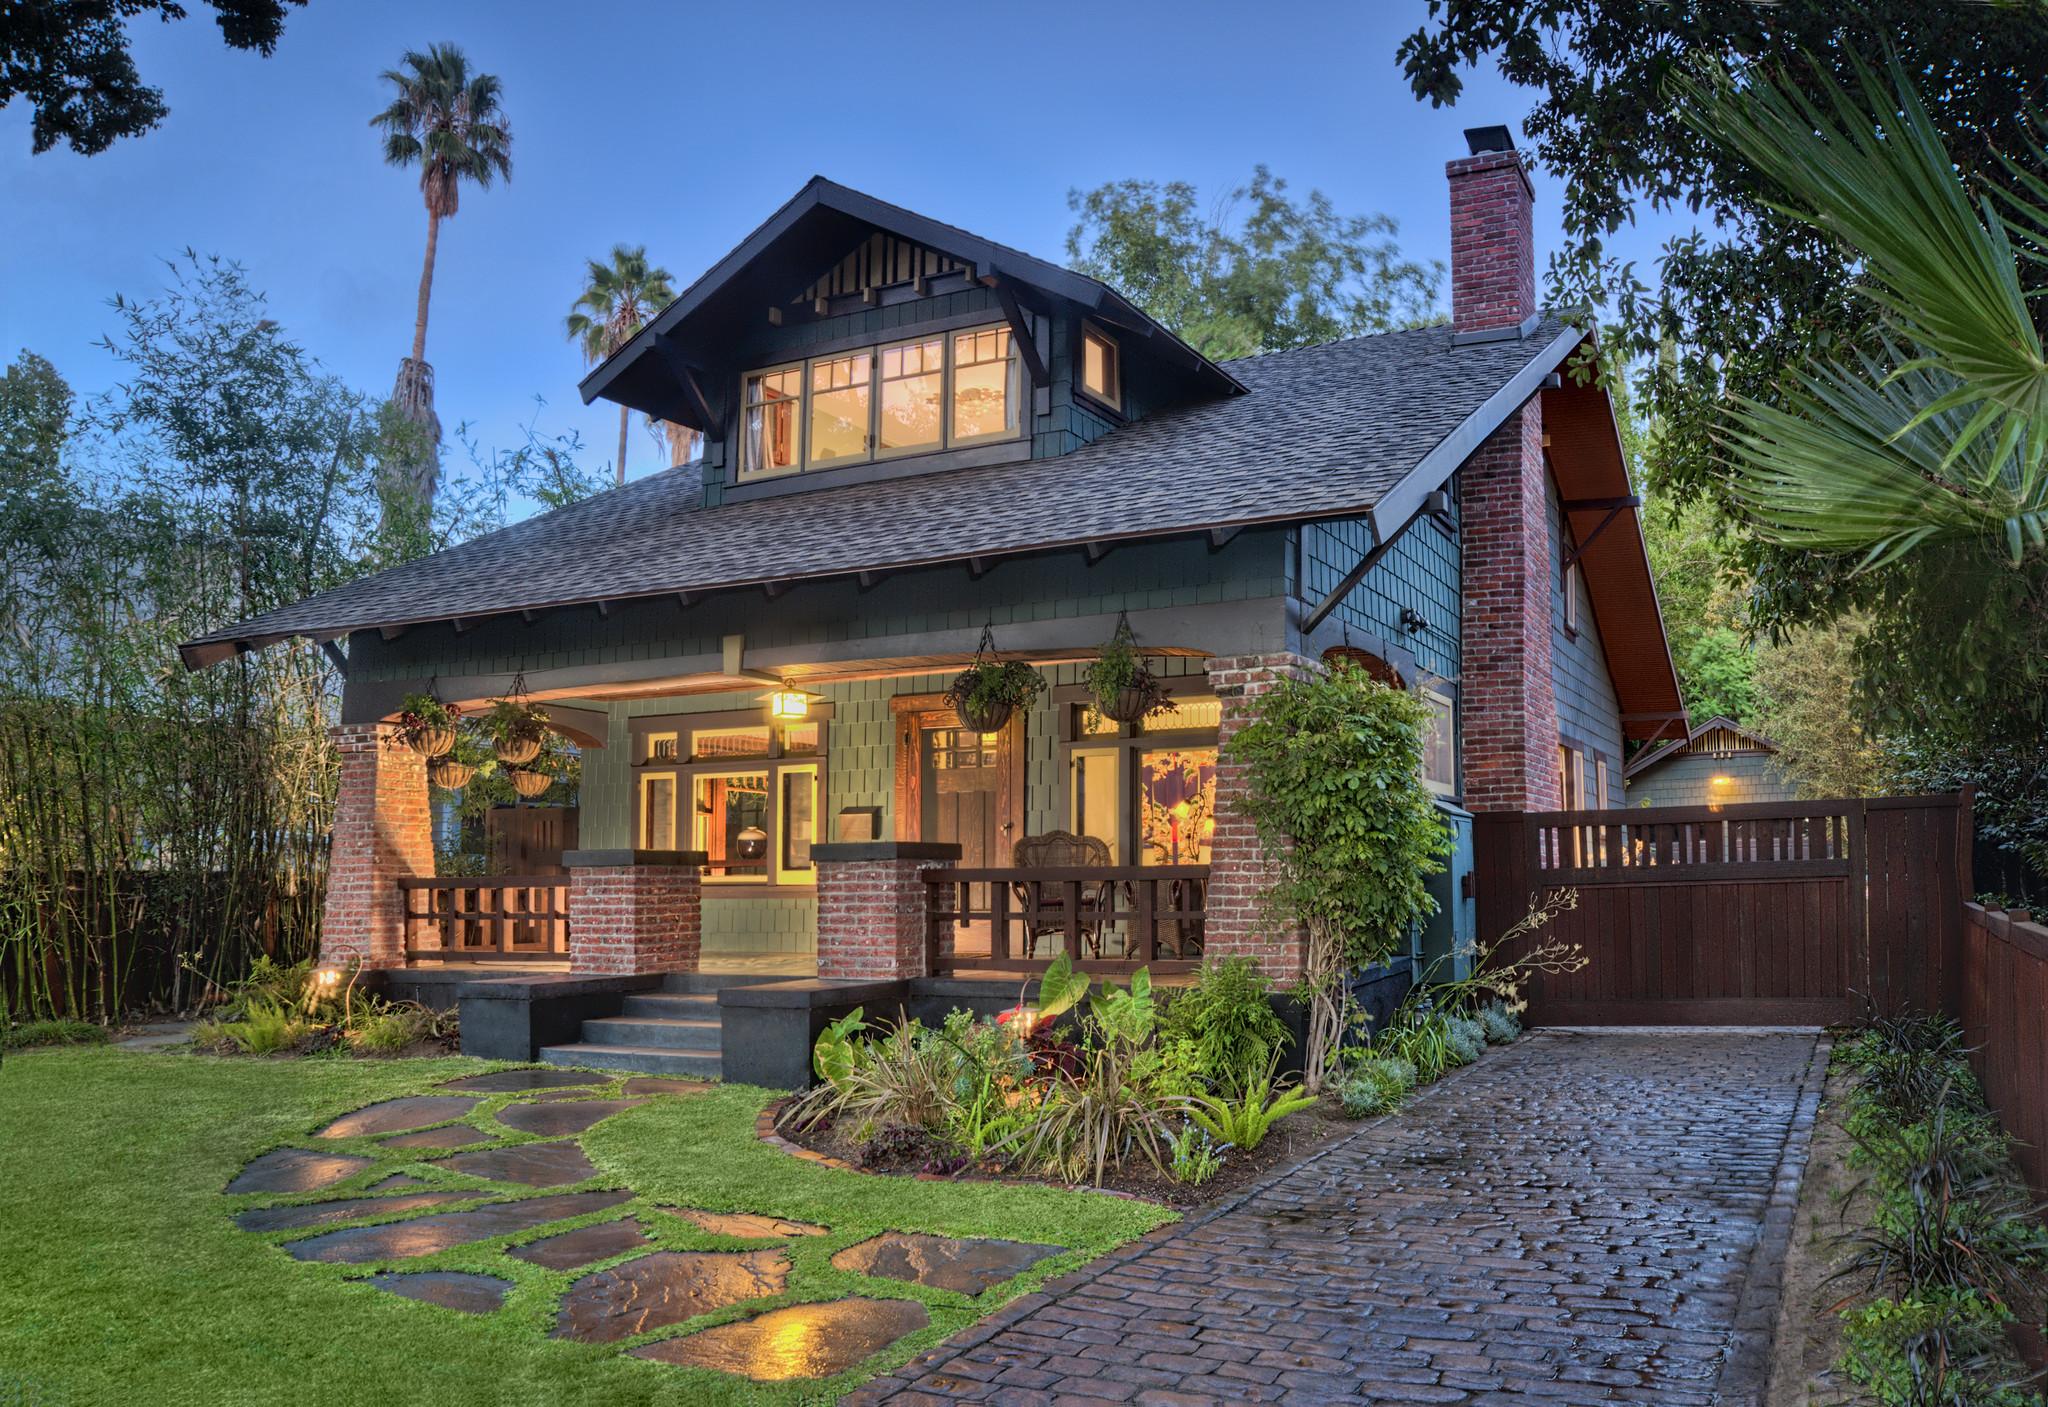 2014 craftsman weekend returns to pasadena la times - What is a craftsman house ...